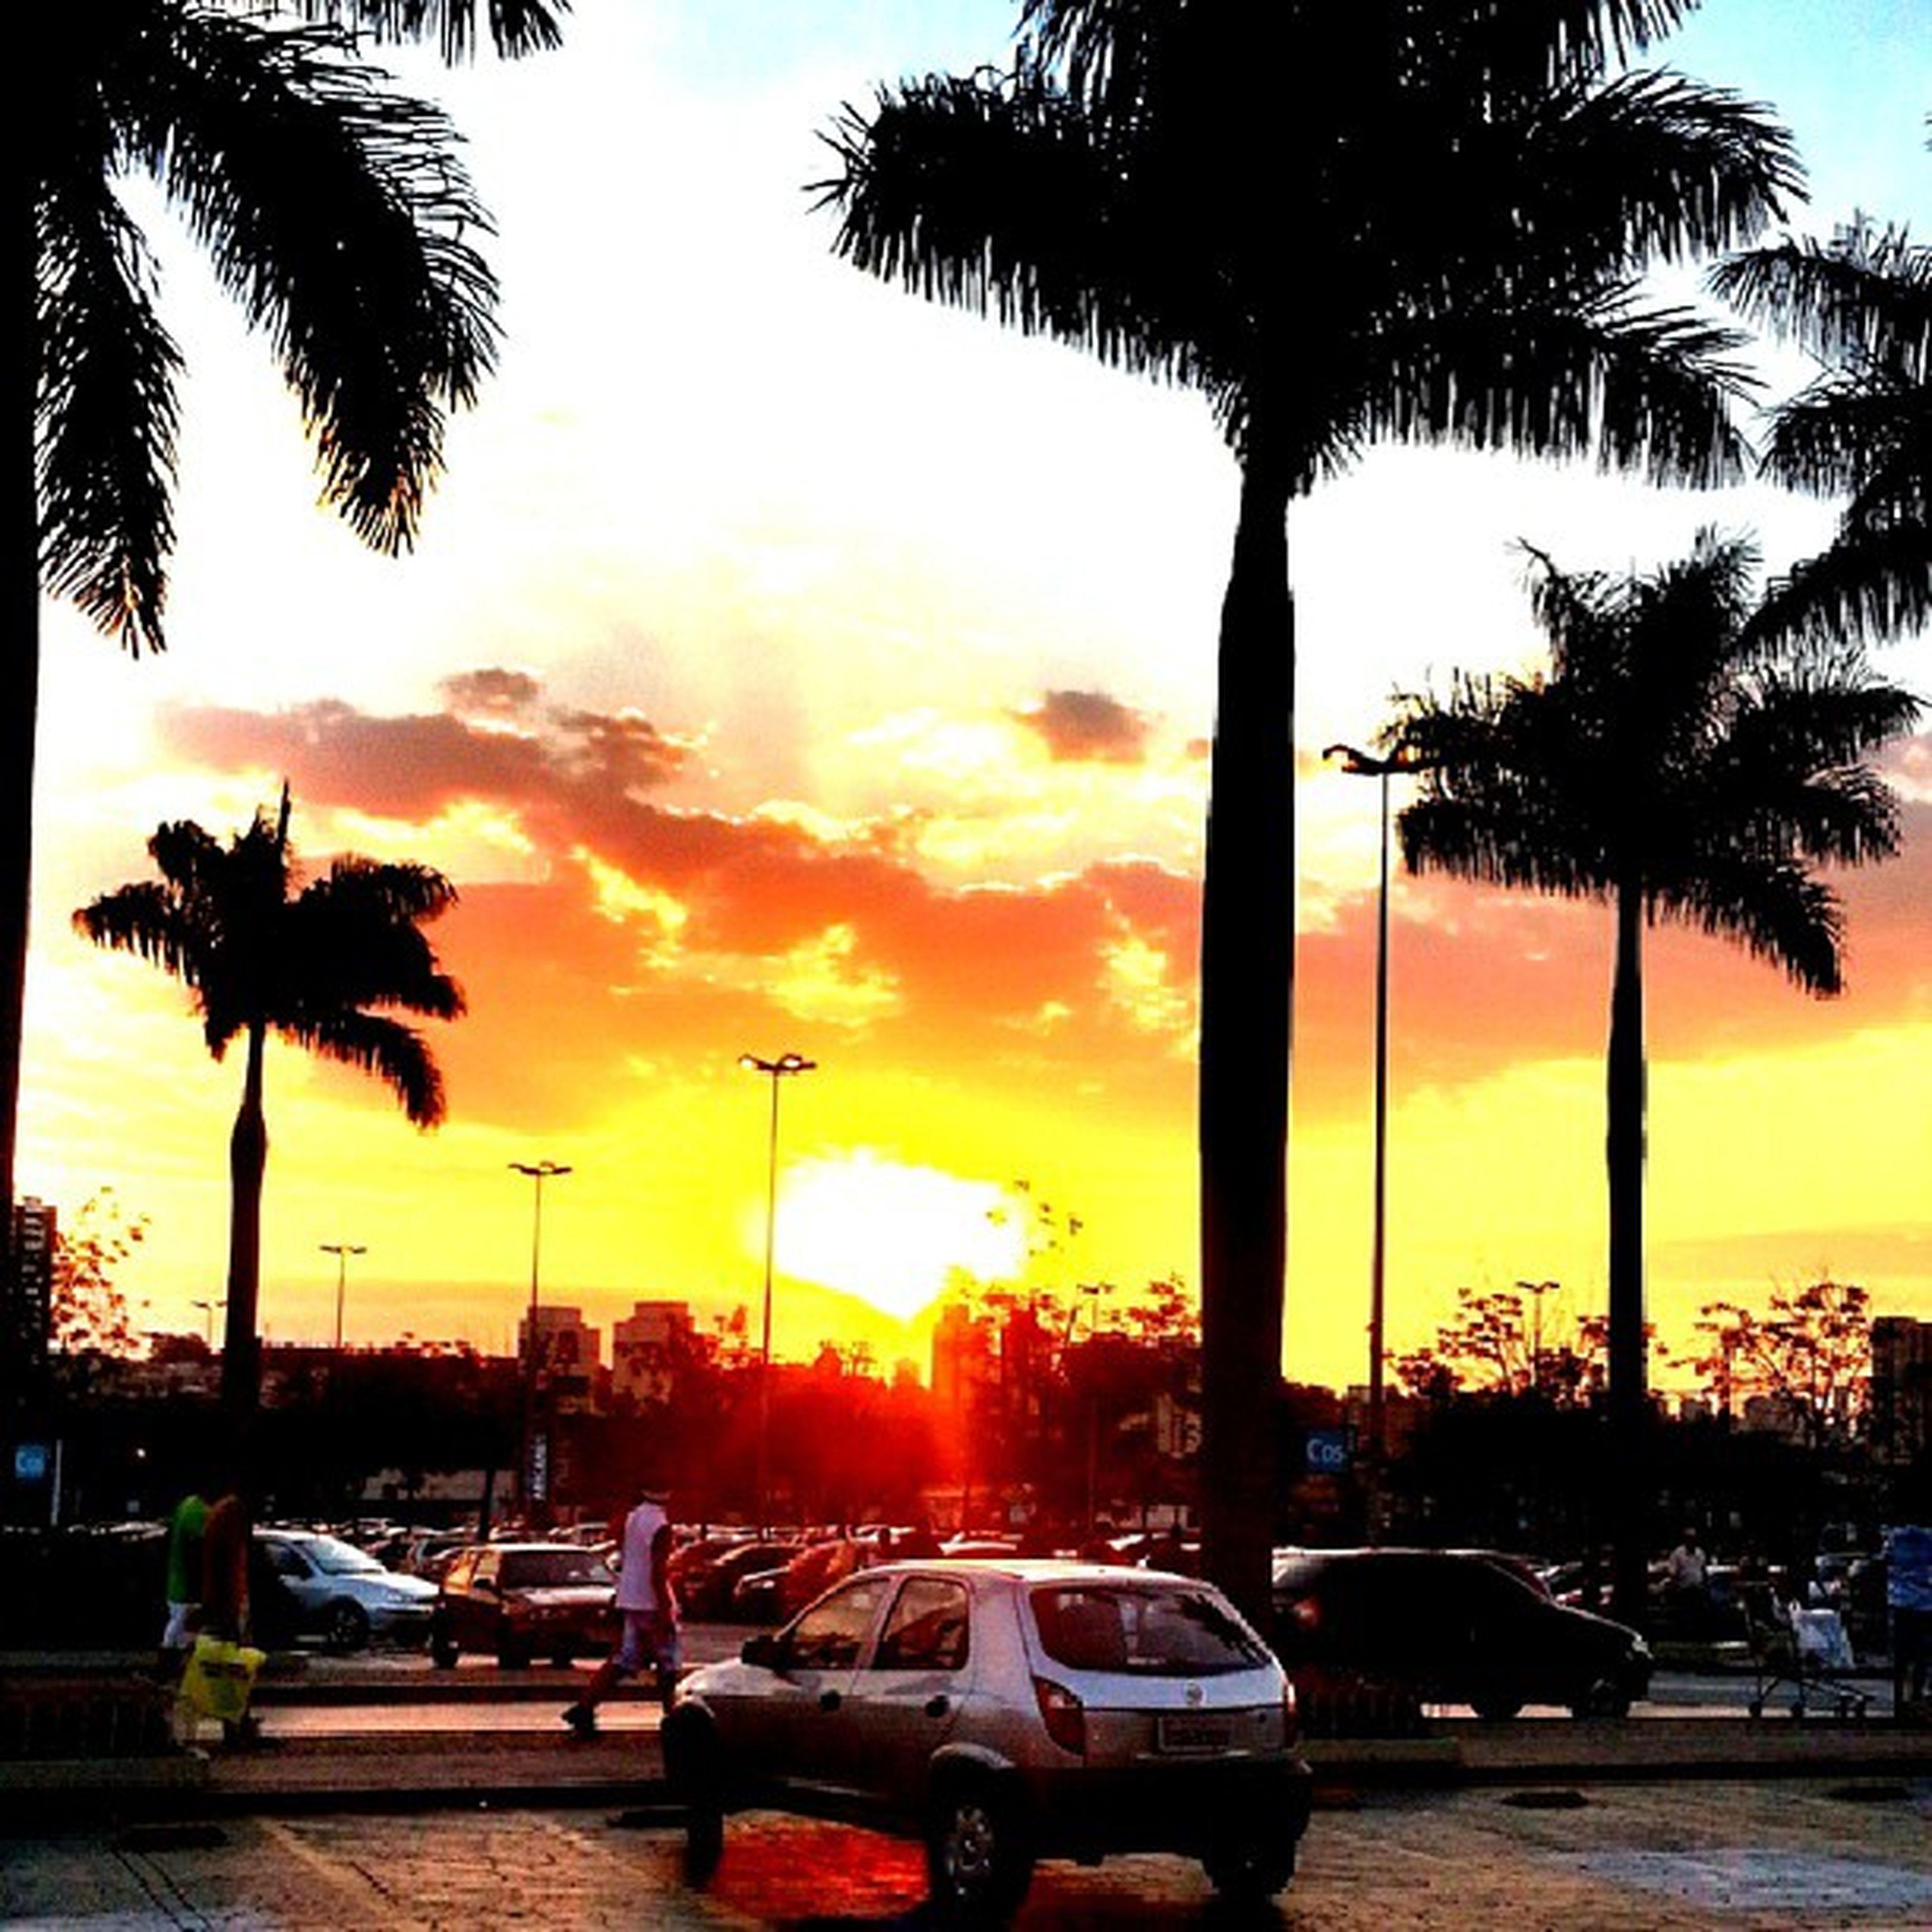 sunset, palm tree, sun, tree, transportation, mode of transport, orange color, silhouette, sea, car, sky, land vehicle, sunlight, beauty in nature, nautical vessel, beach, water, travel, scenics, tree trunk